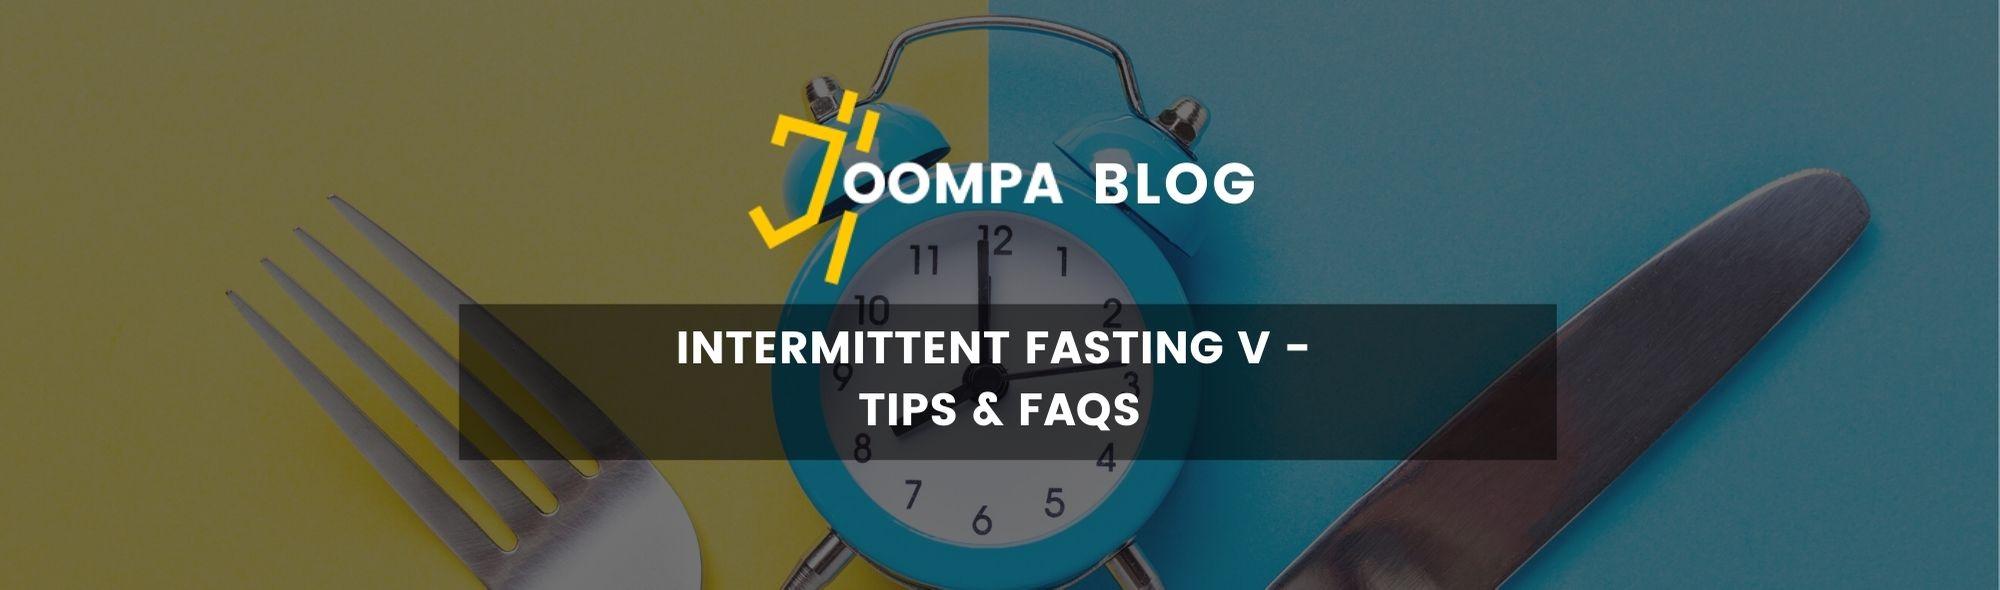 Intermittent Fasting V - Tips & FAQs